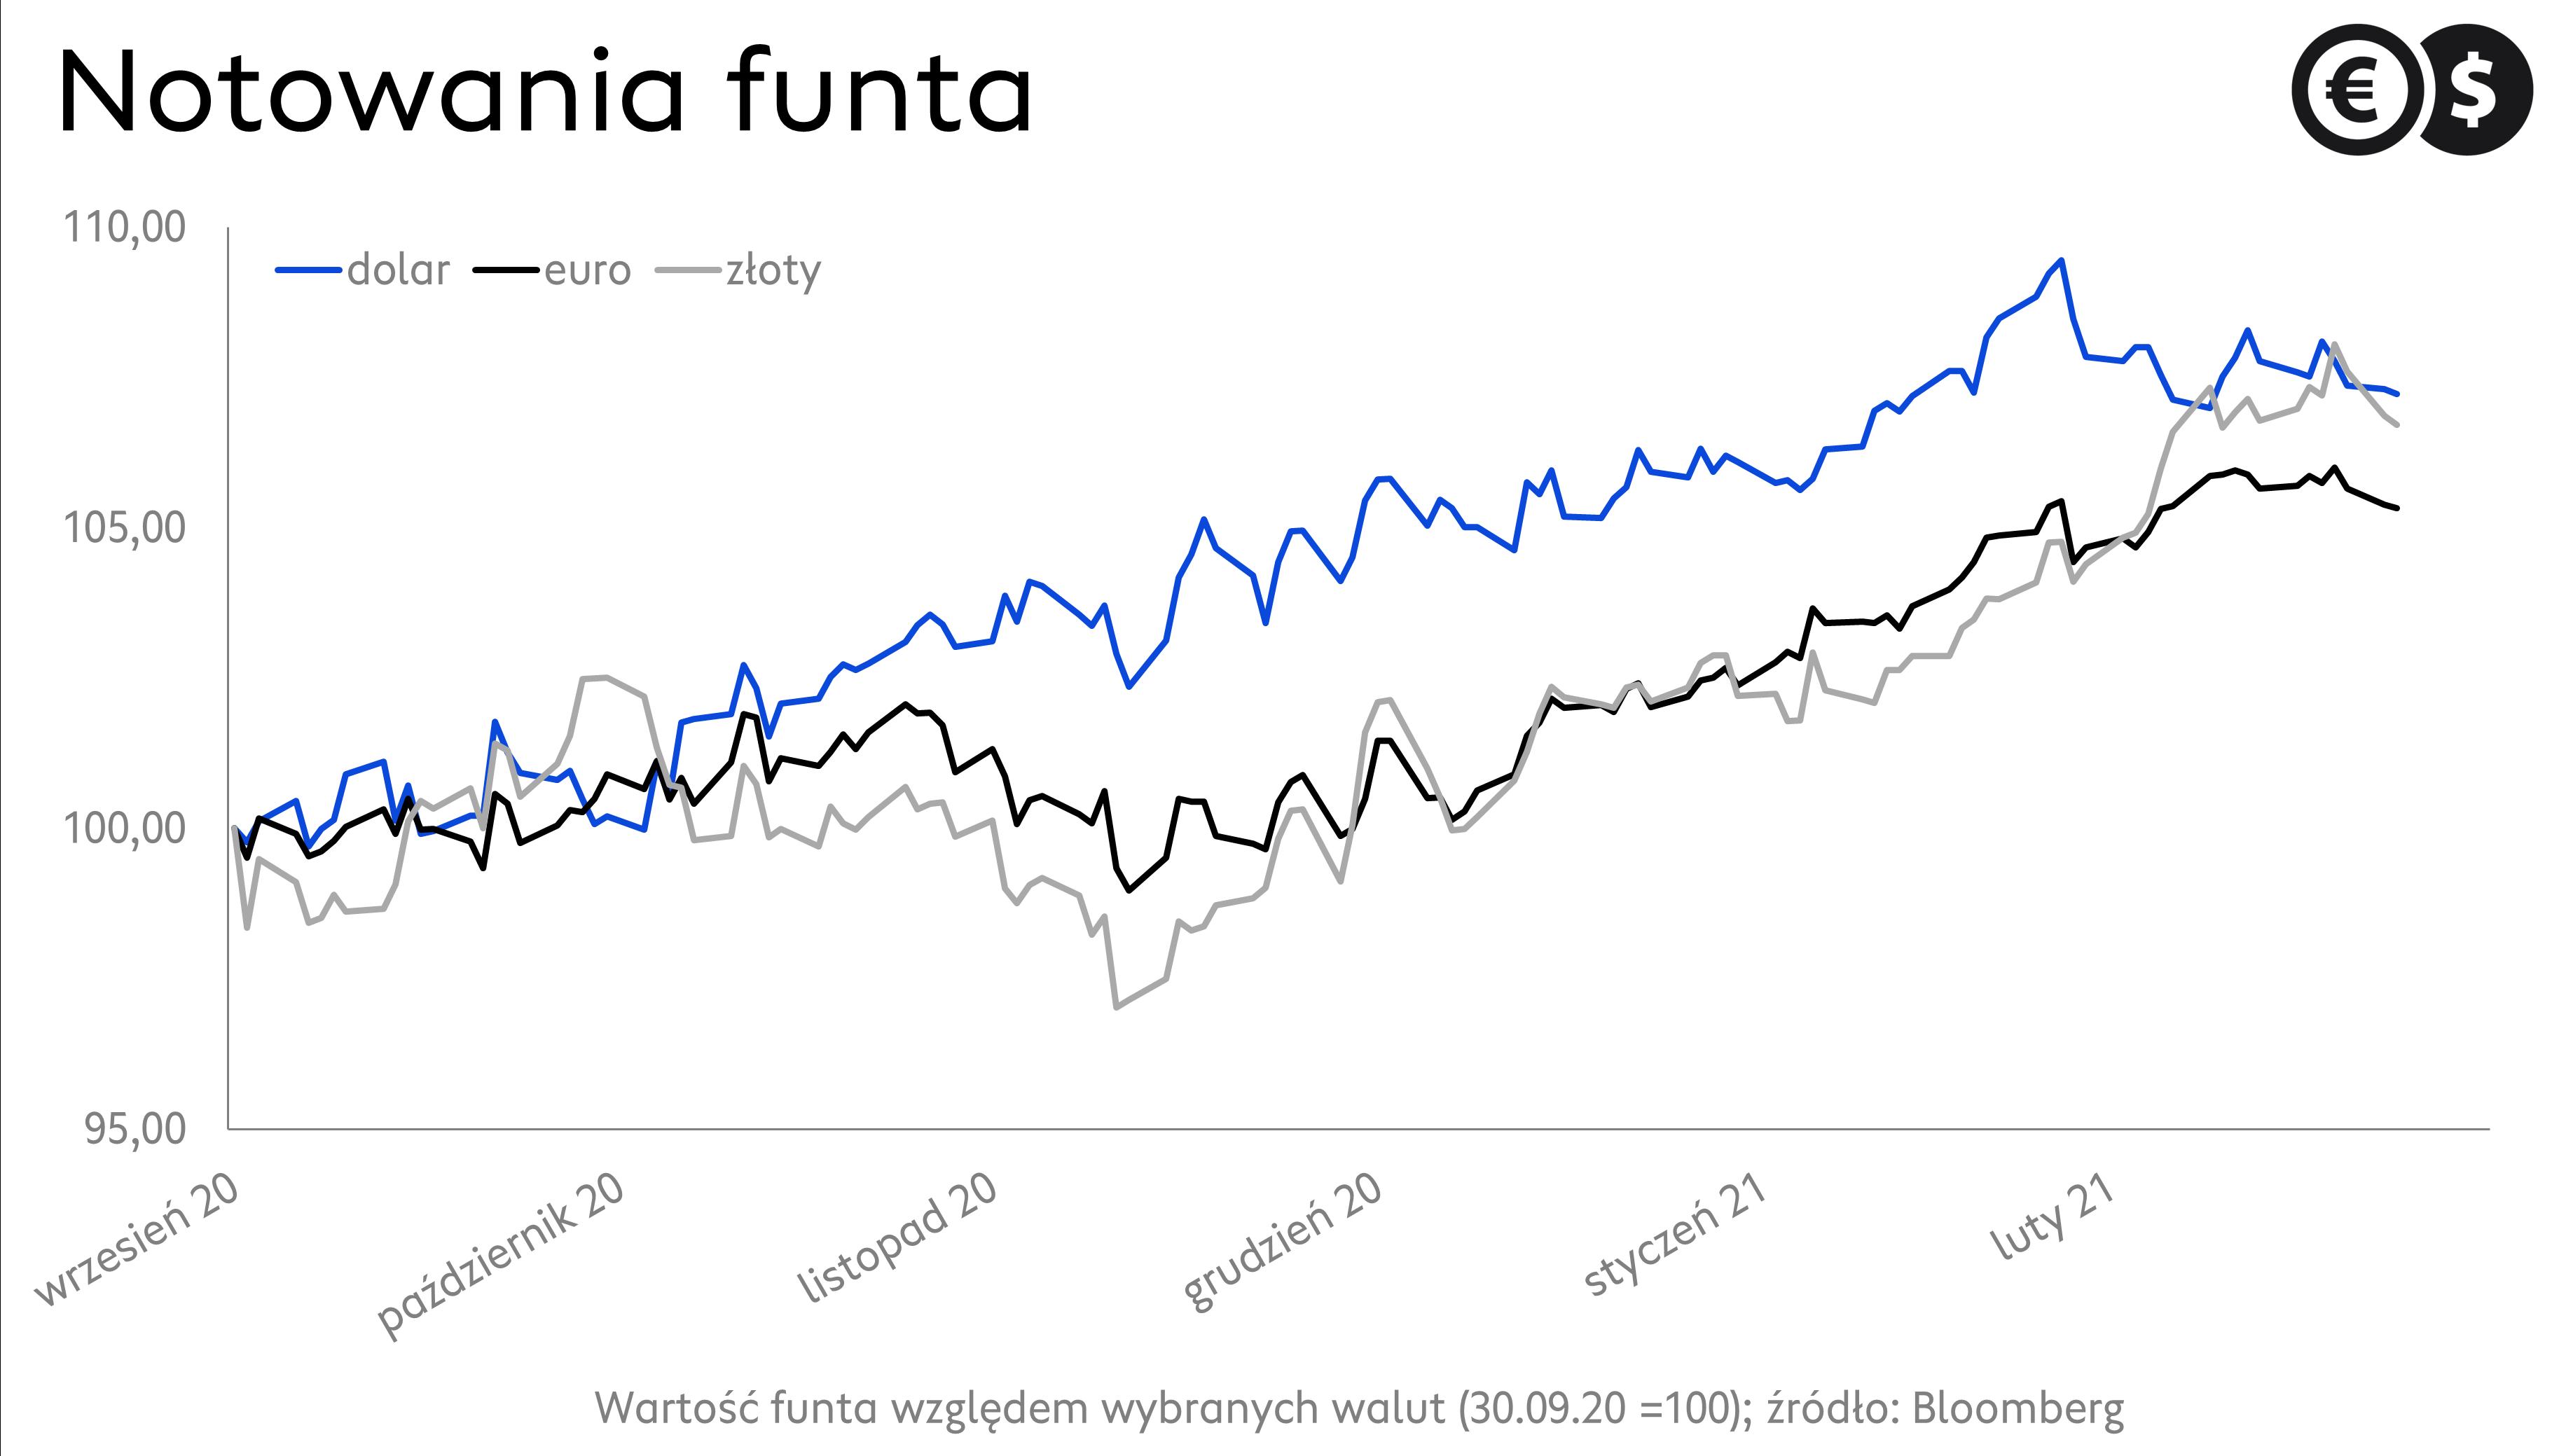 Kurs funta: wykres EUR/GBP, GBP/PLN i GBP/USD; źródło: Bloomberg